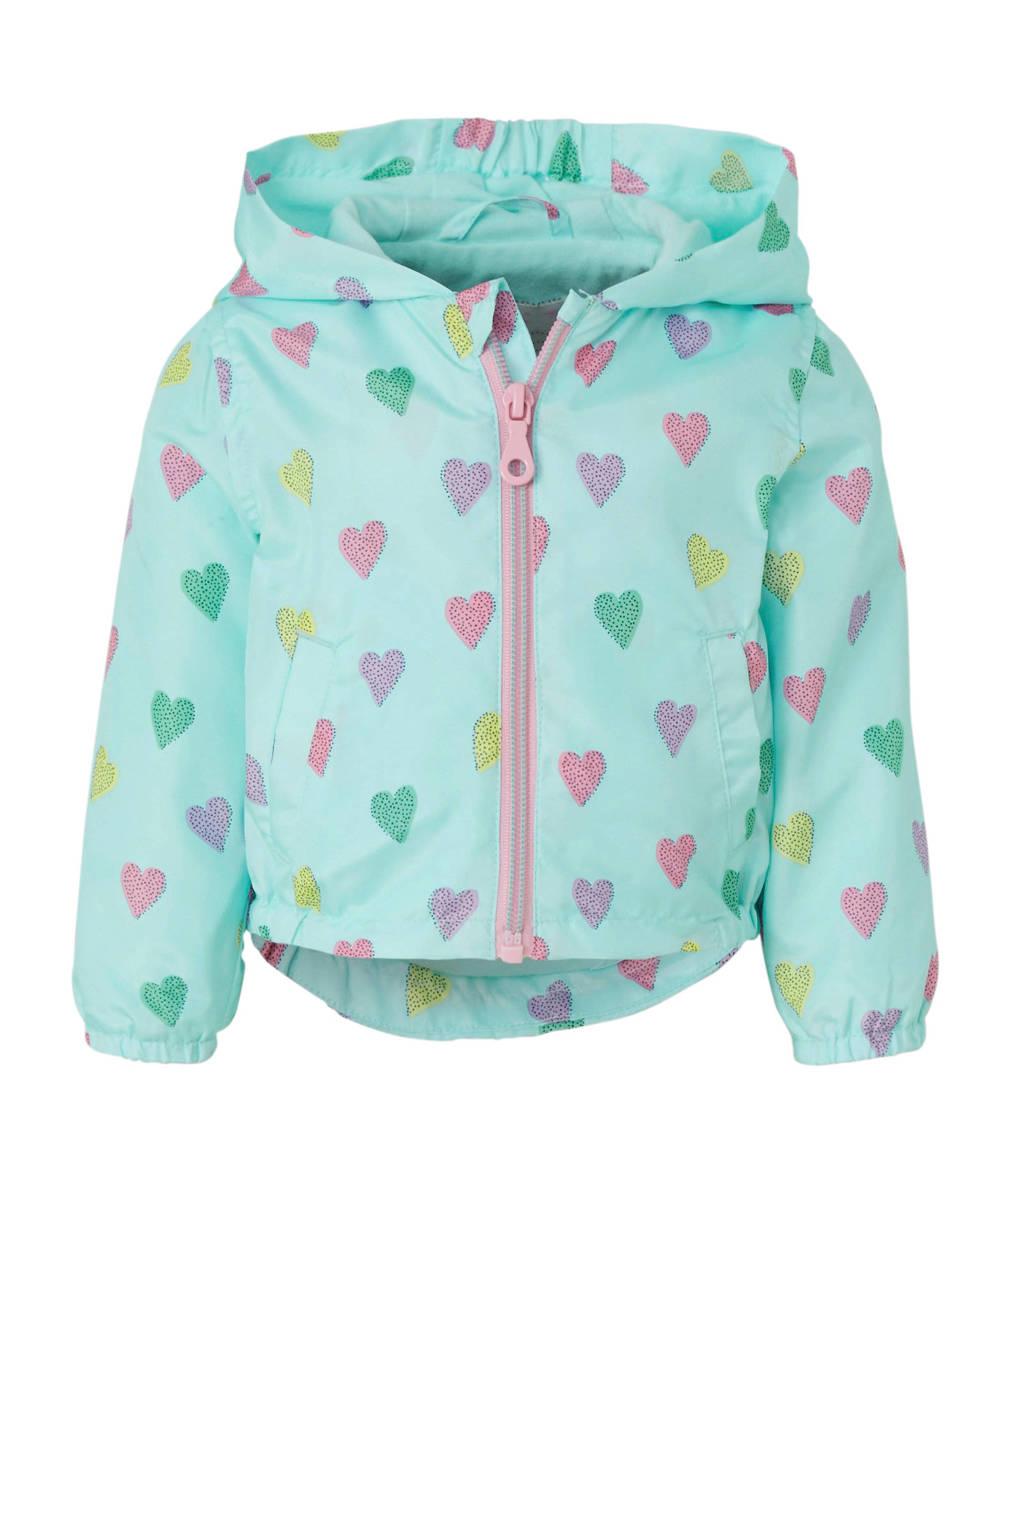 C&A Baby Club zomerjas met hartjes blauw, Lichtblauw